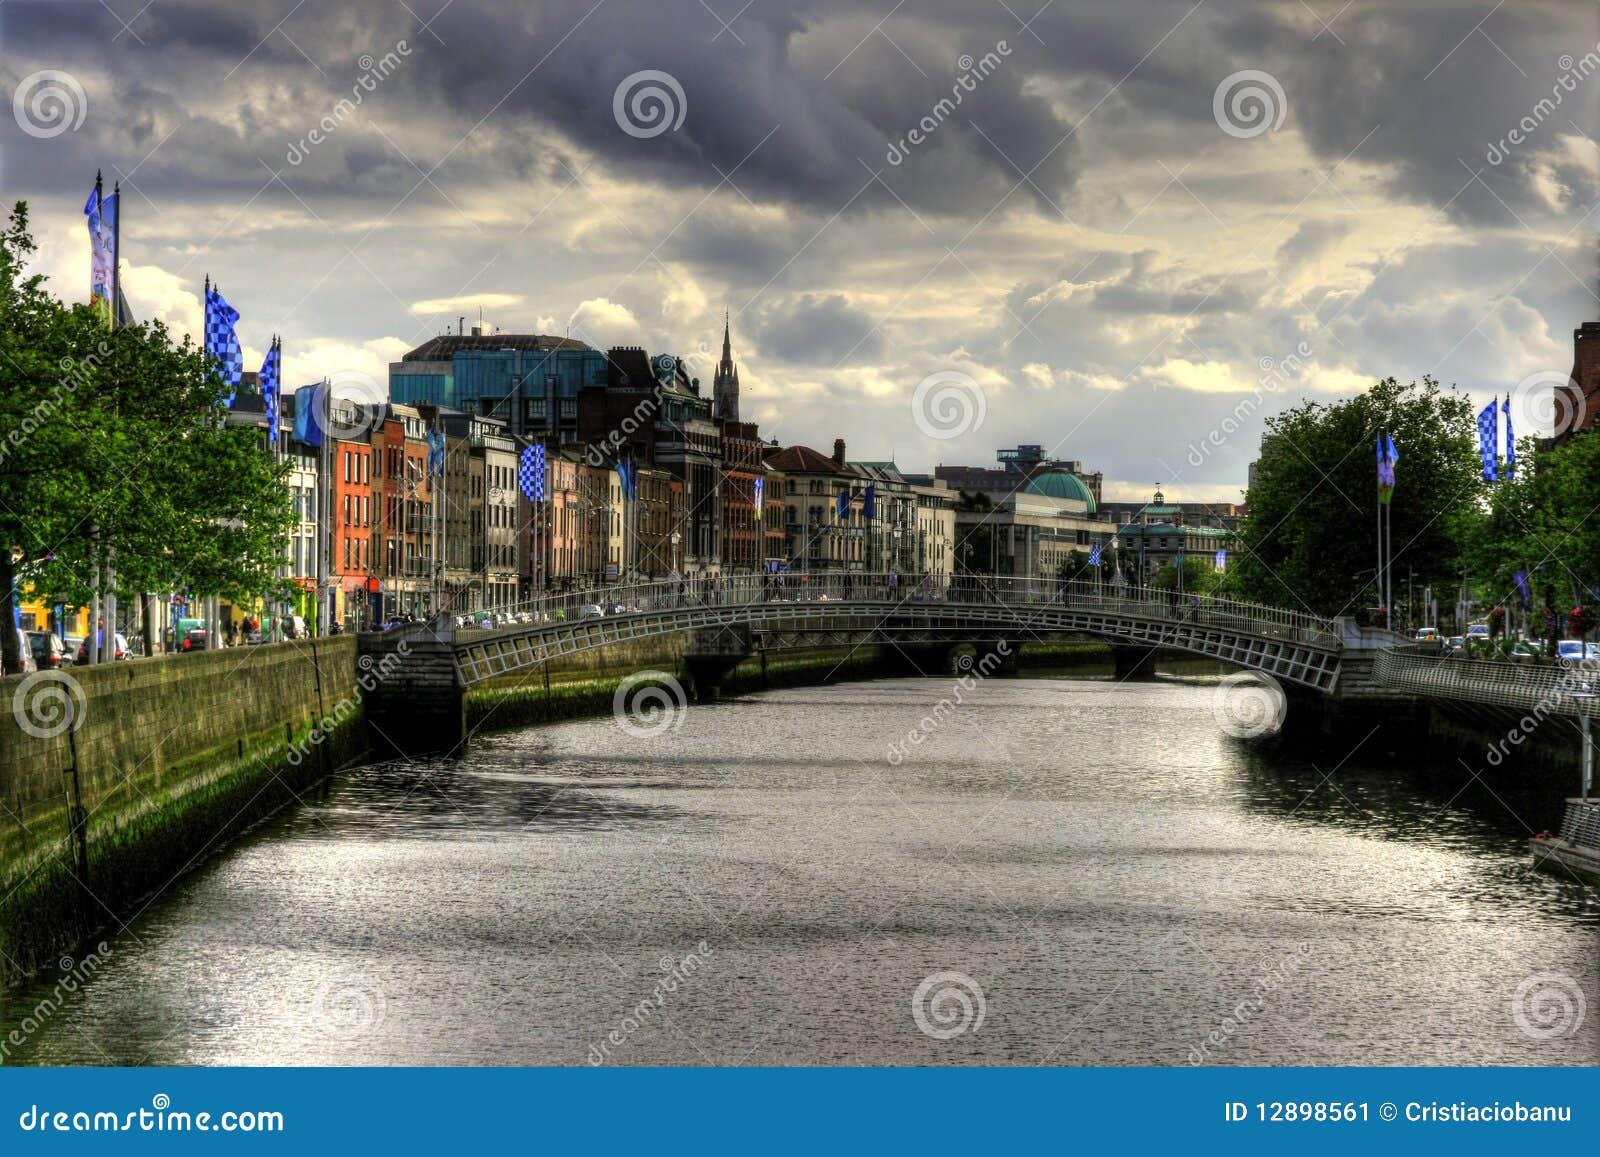 River Liffey in Dublin city, Ireland